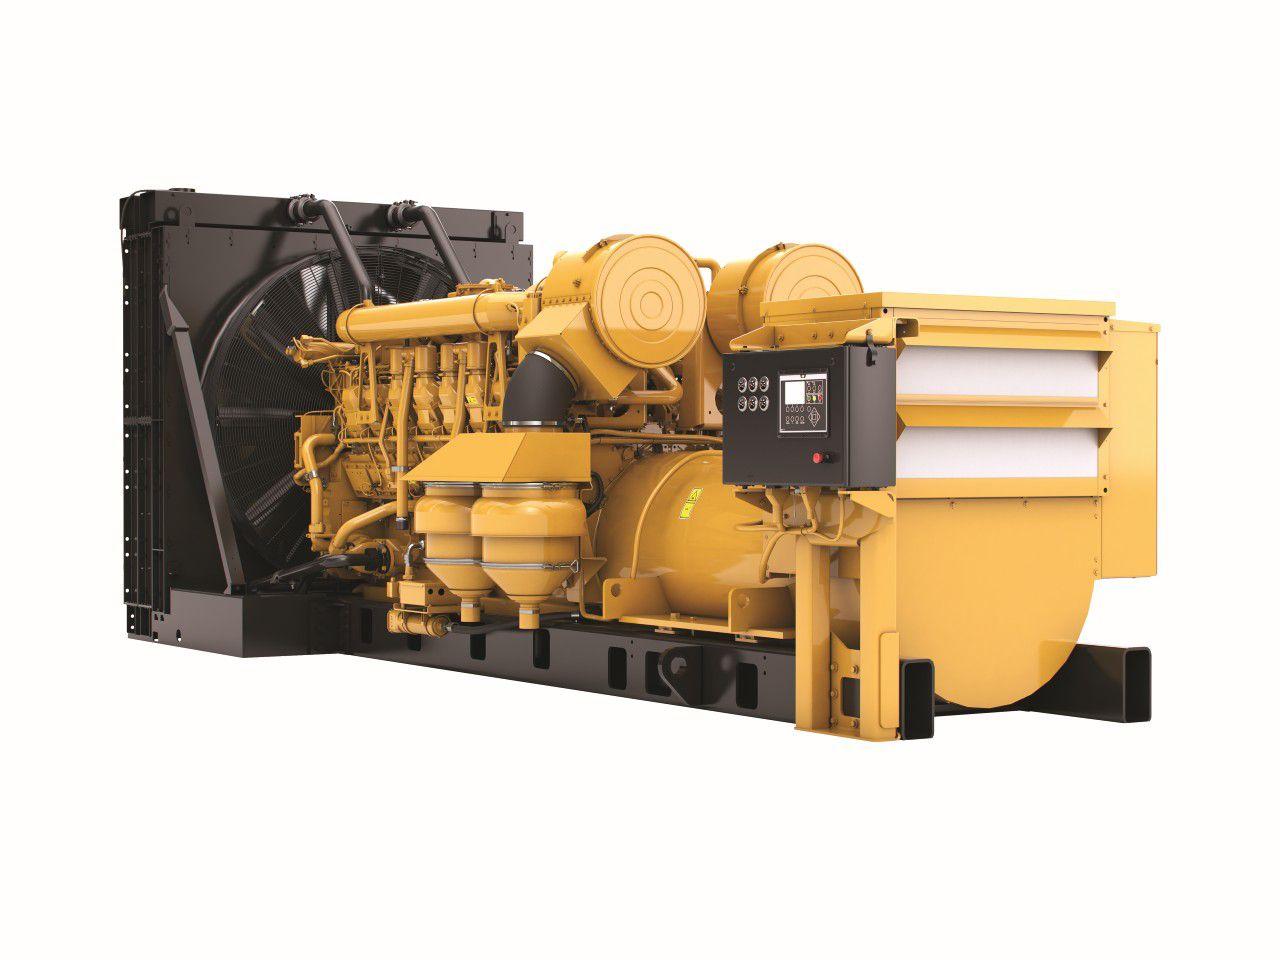 3516B Diesel Generator Set with Dynamic Gas Blending